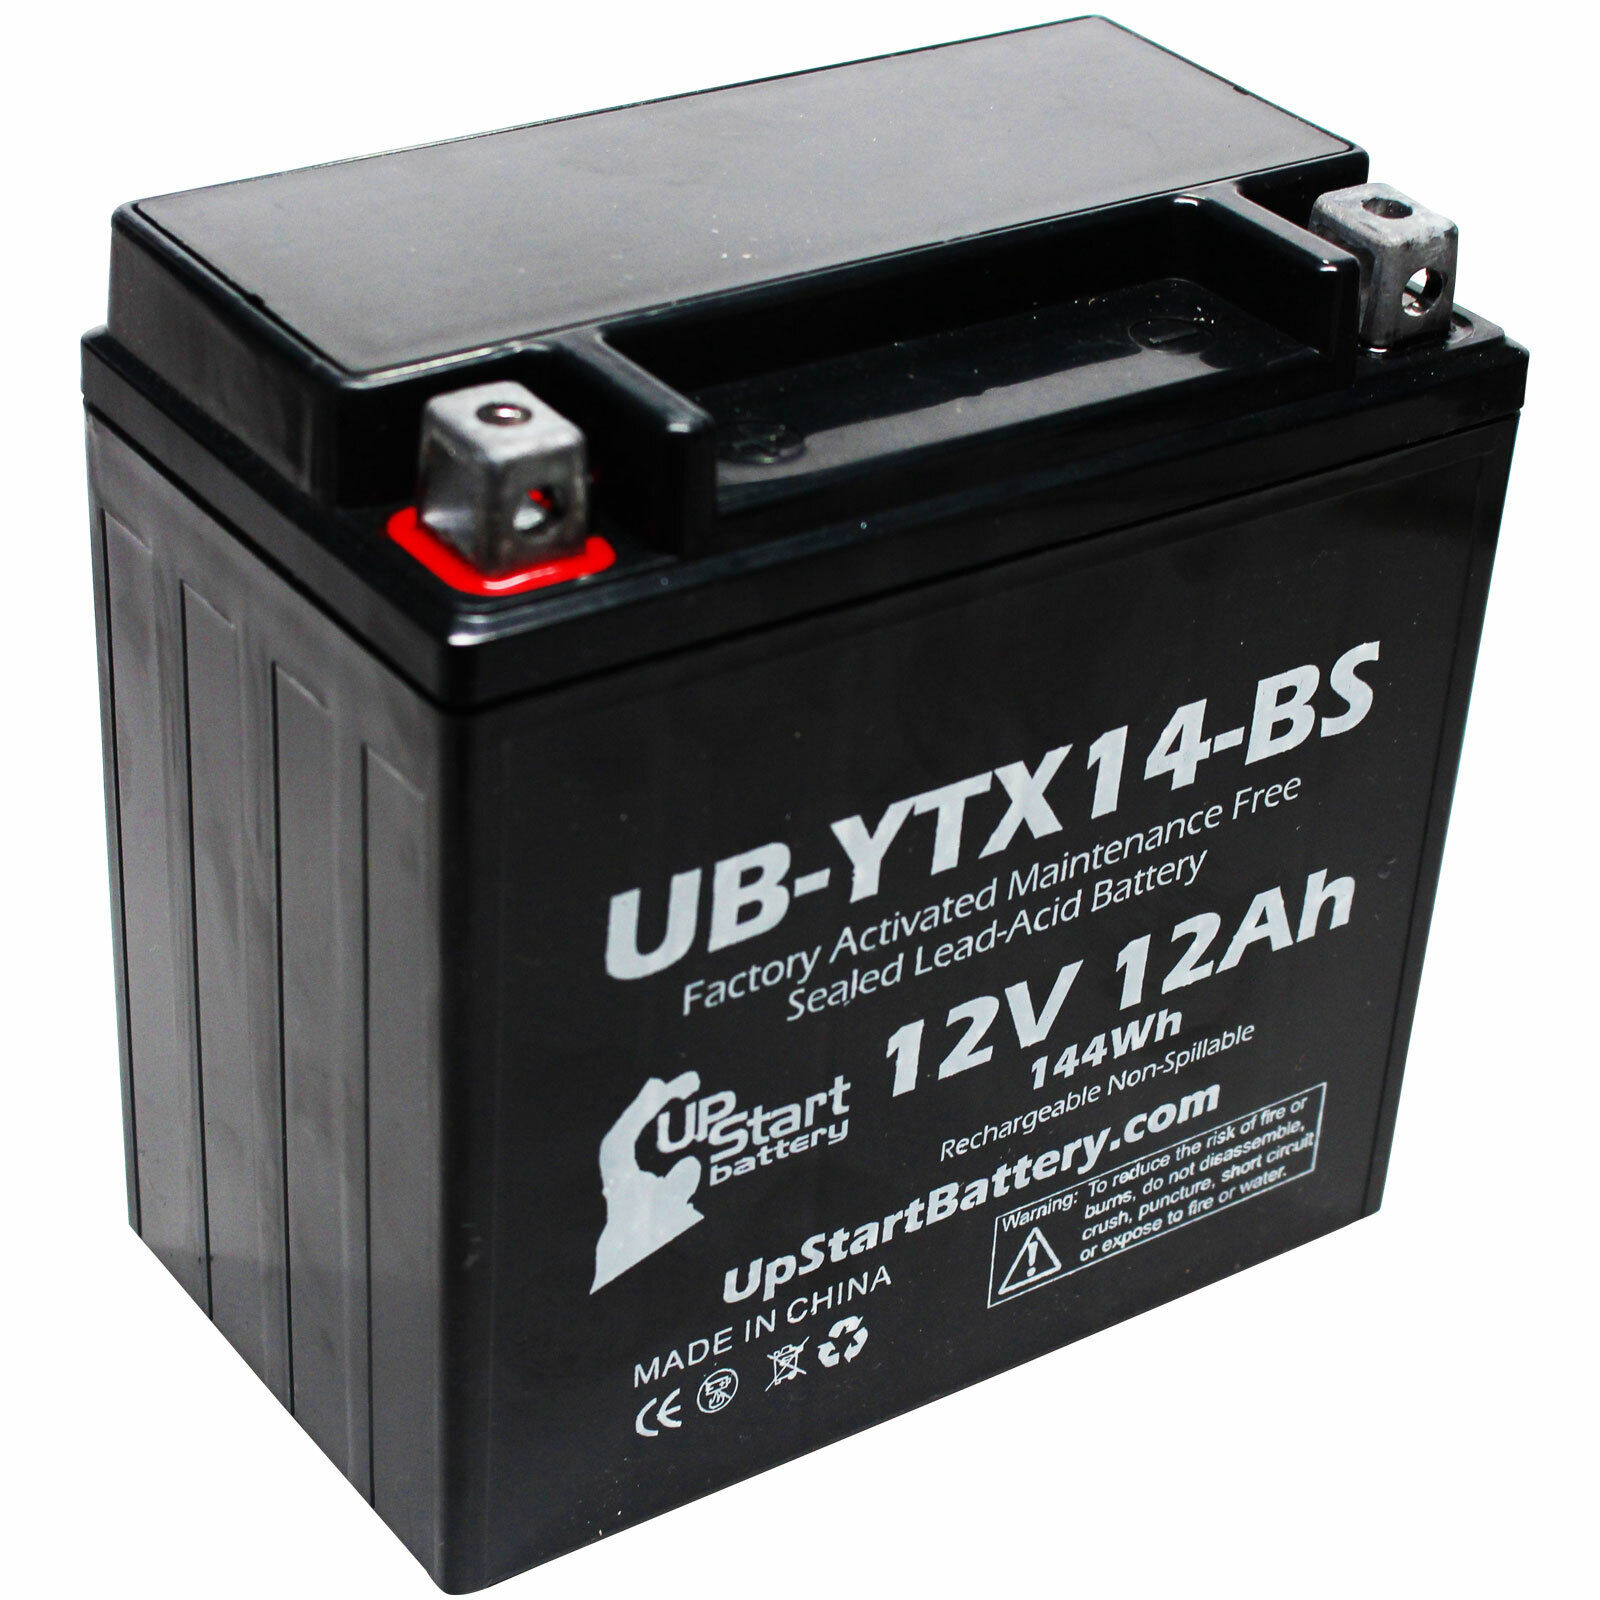 12V 12AH Battery for 2001 Honda TRX350 Rancher 350 CC